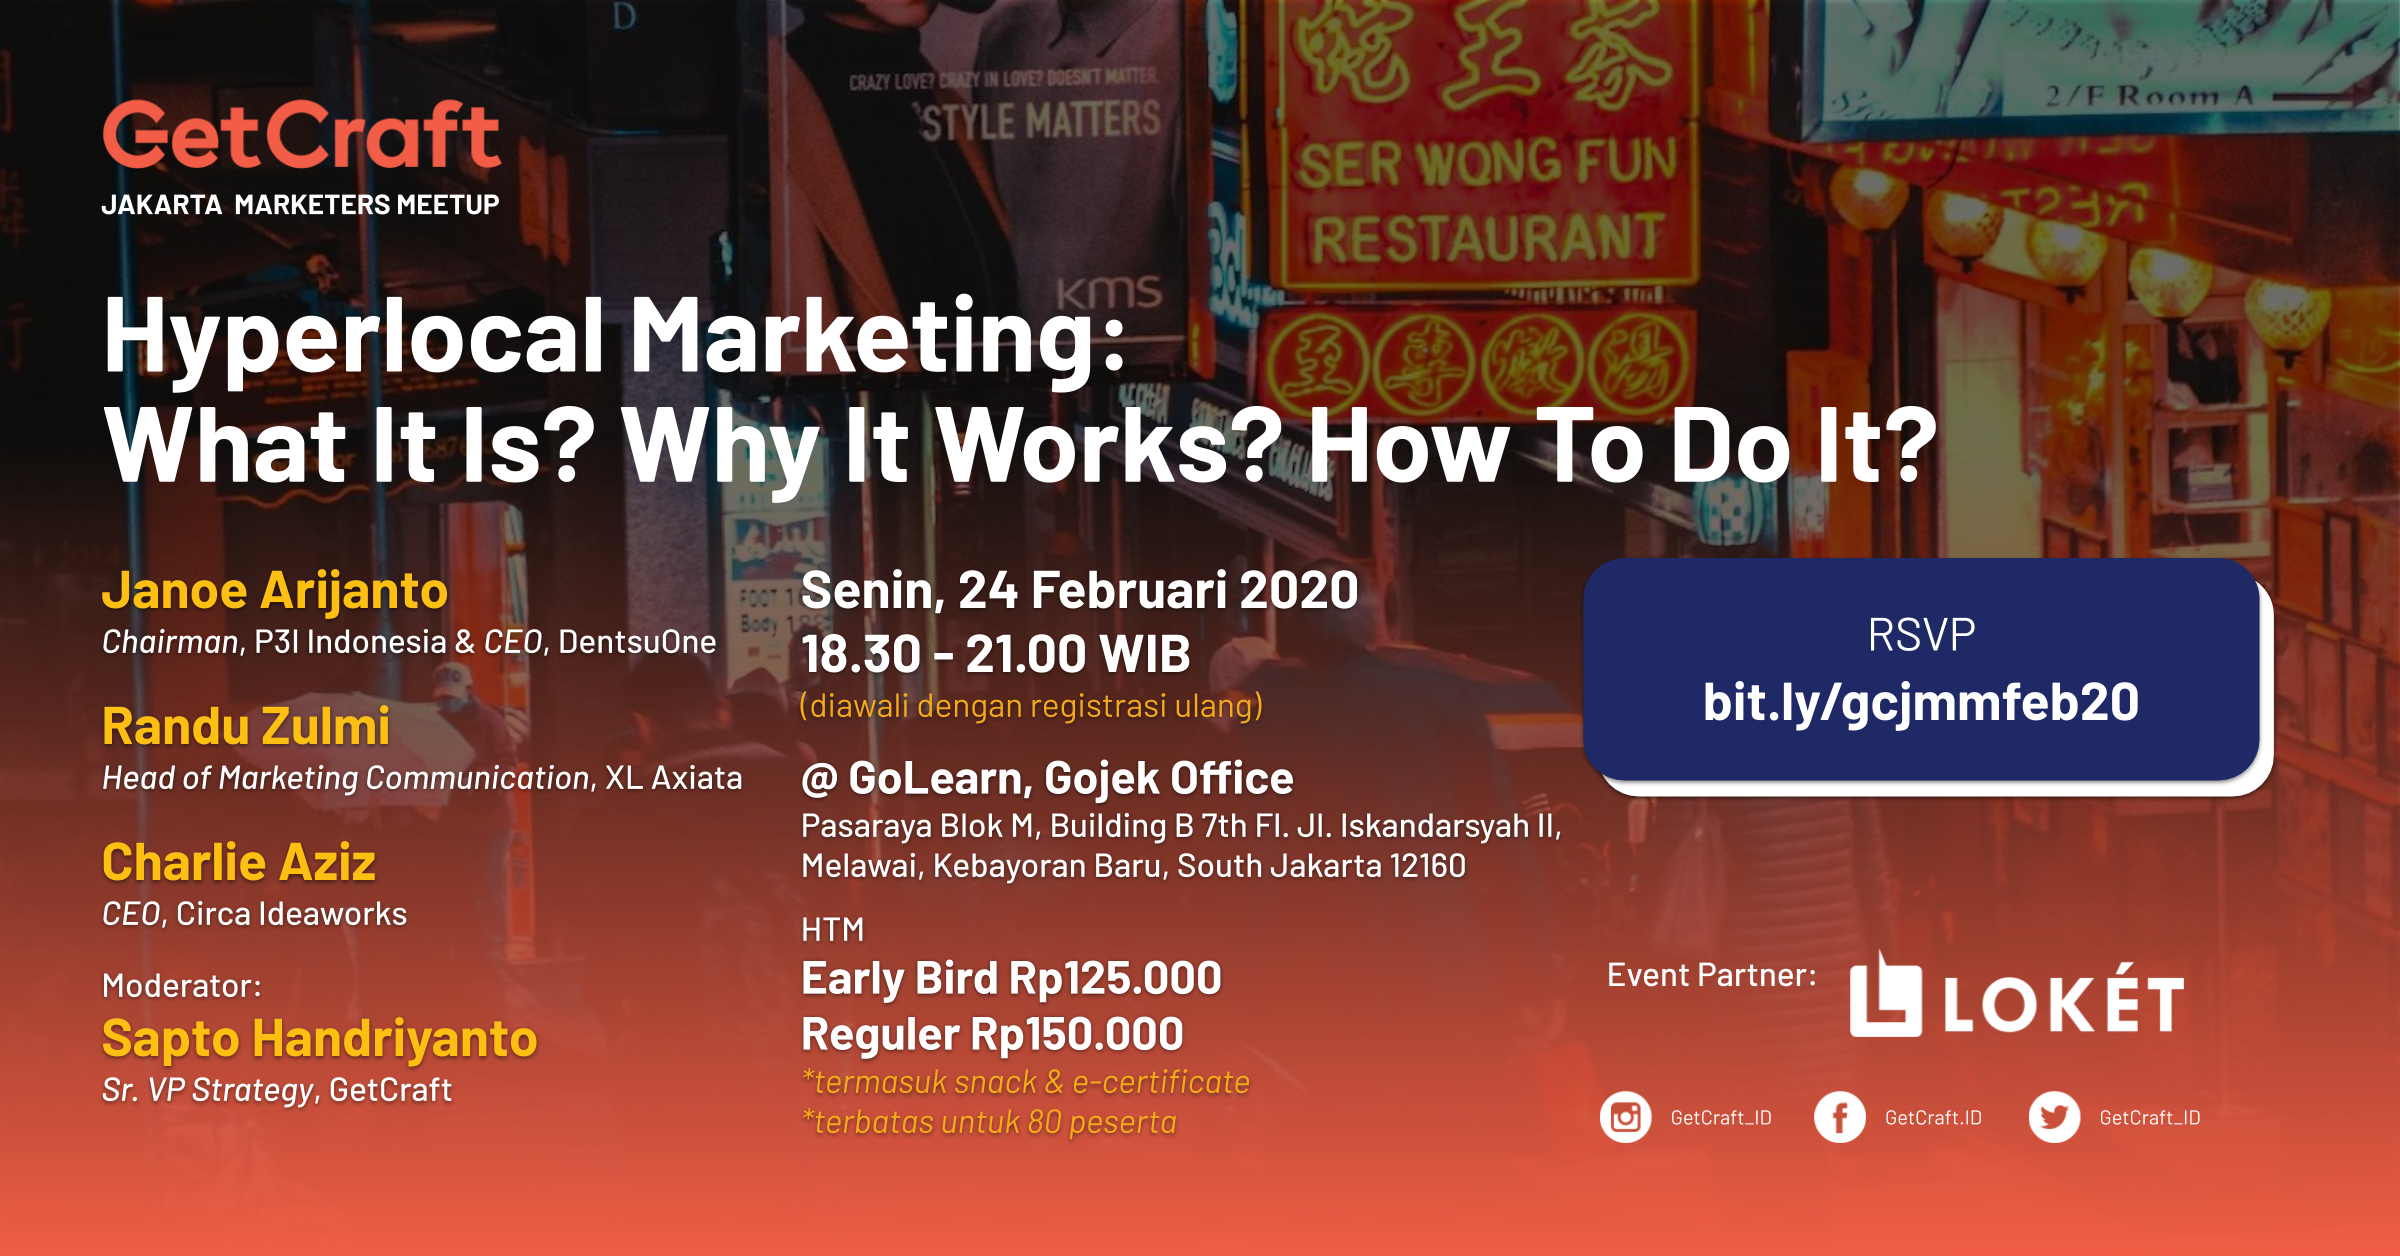 Jakarta Marketers Meetup Ed. Februari 2020